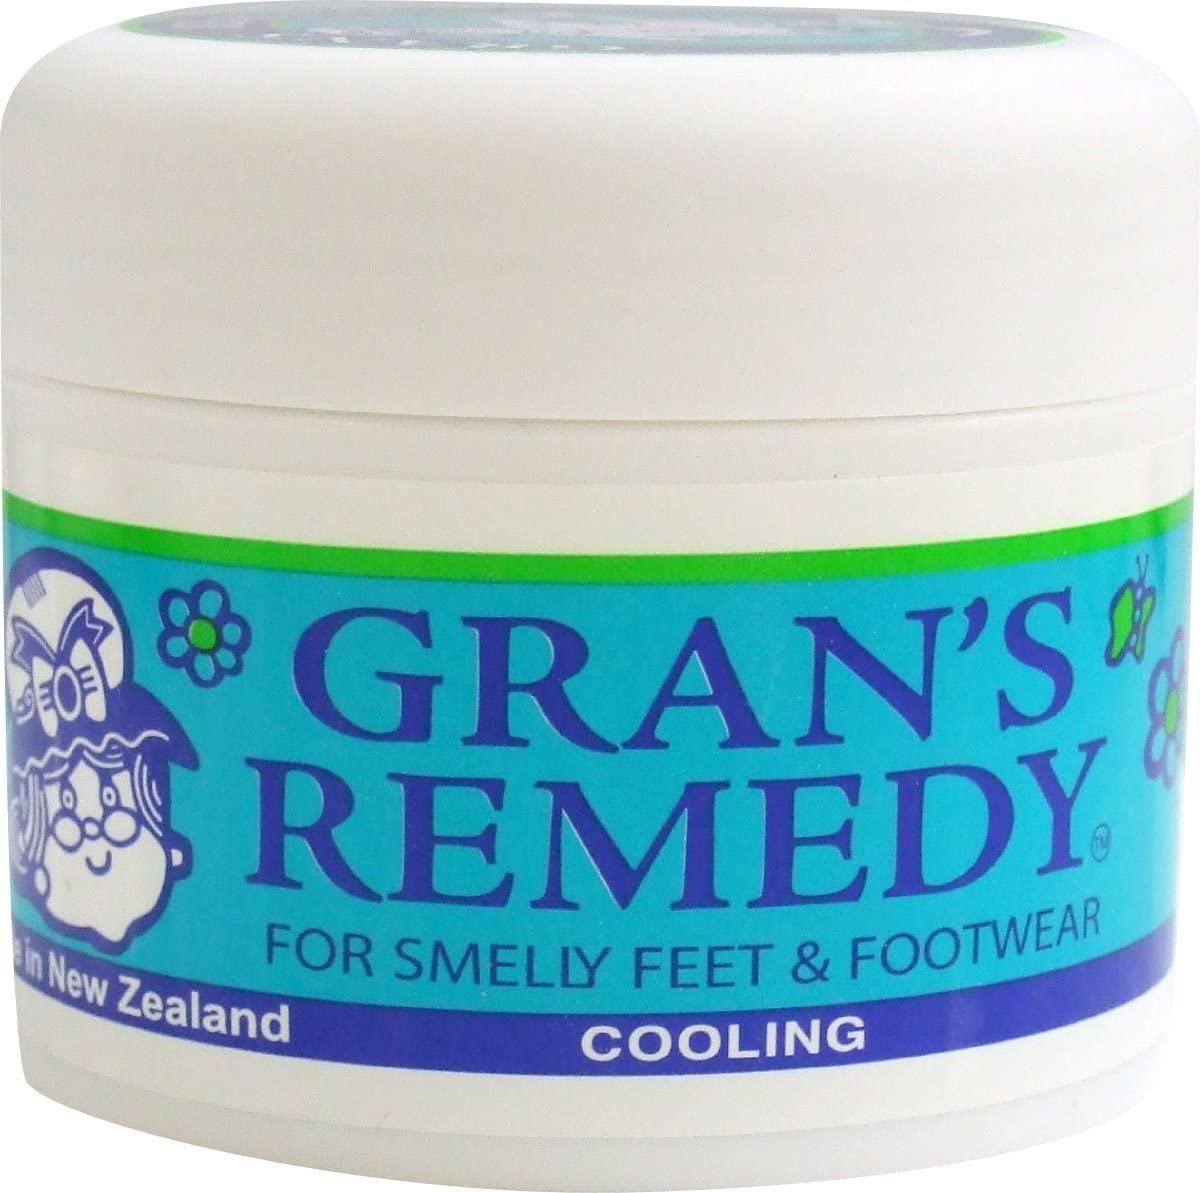 Foot Odor Eliminator for Smelly Feet & Footwear, Foot Care Powder,freshens Better Than Spray Deodorant